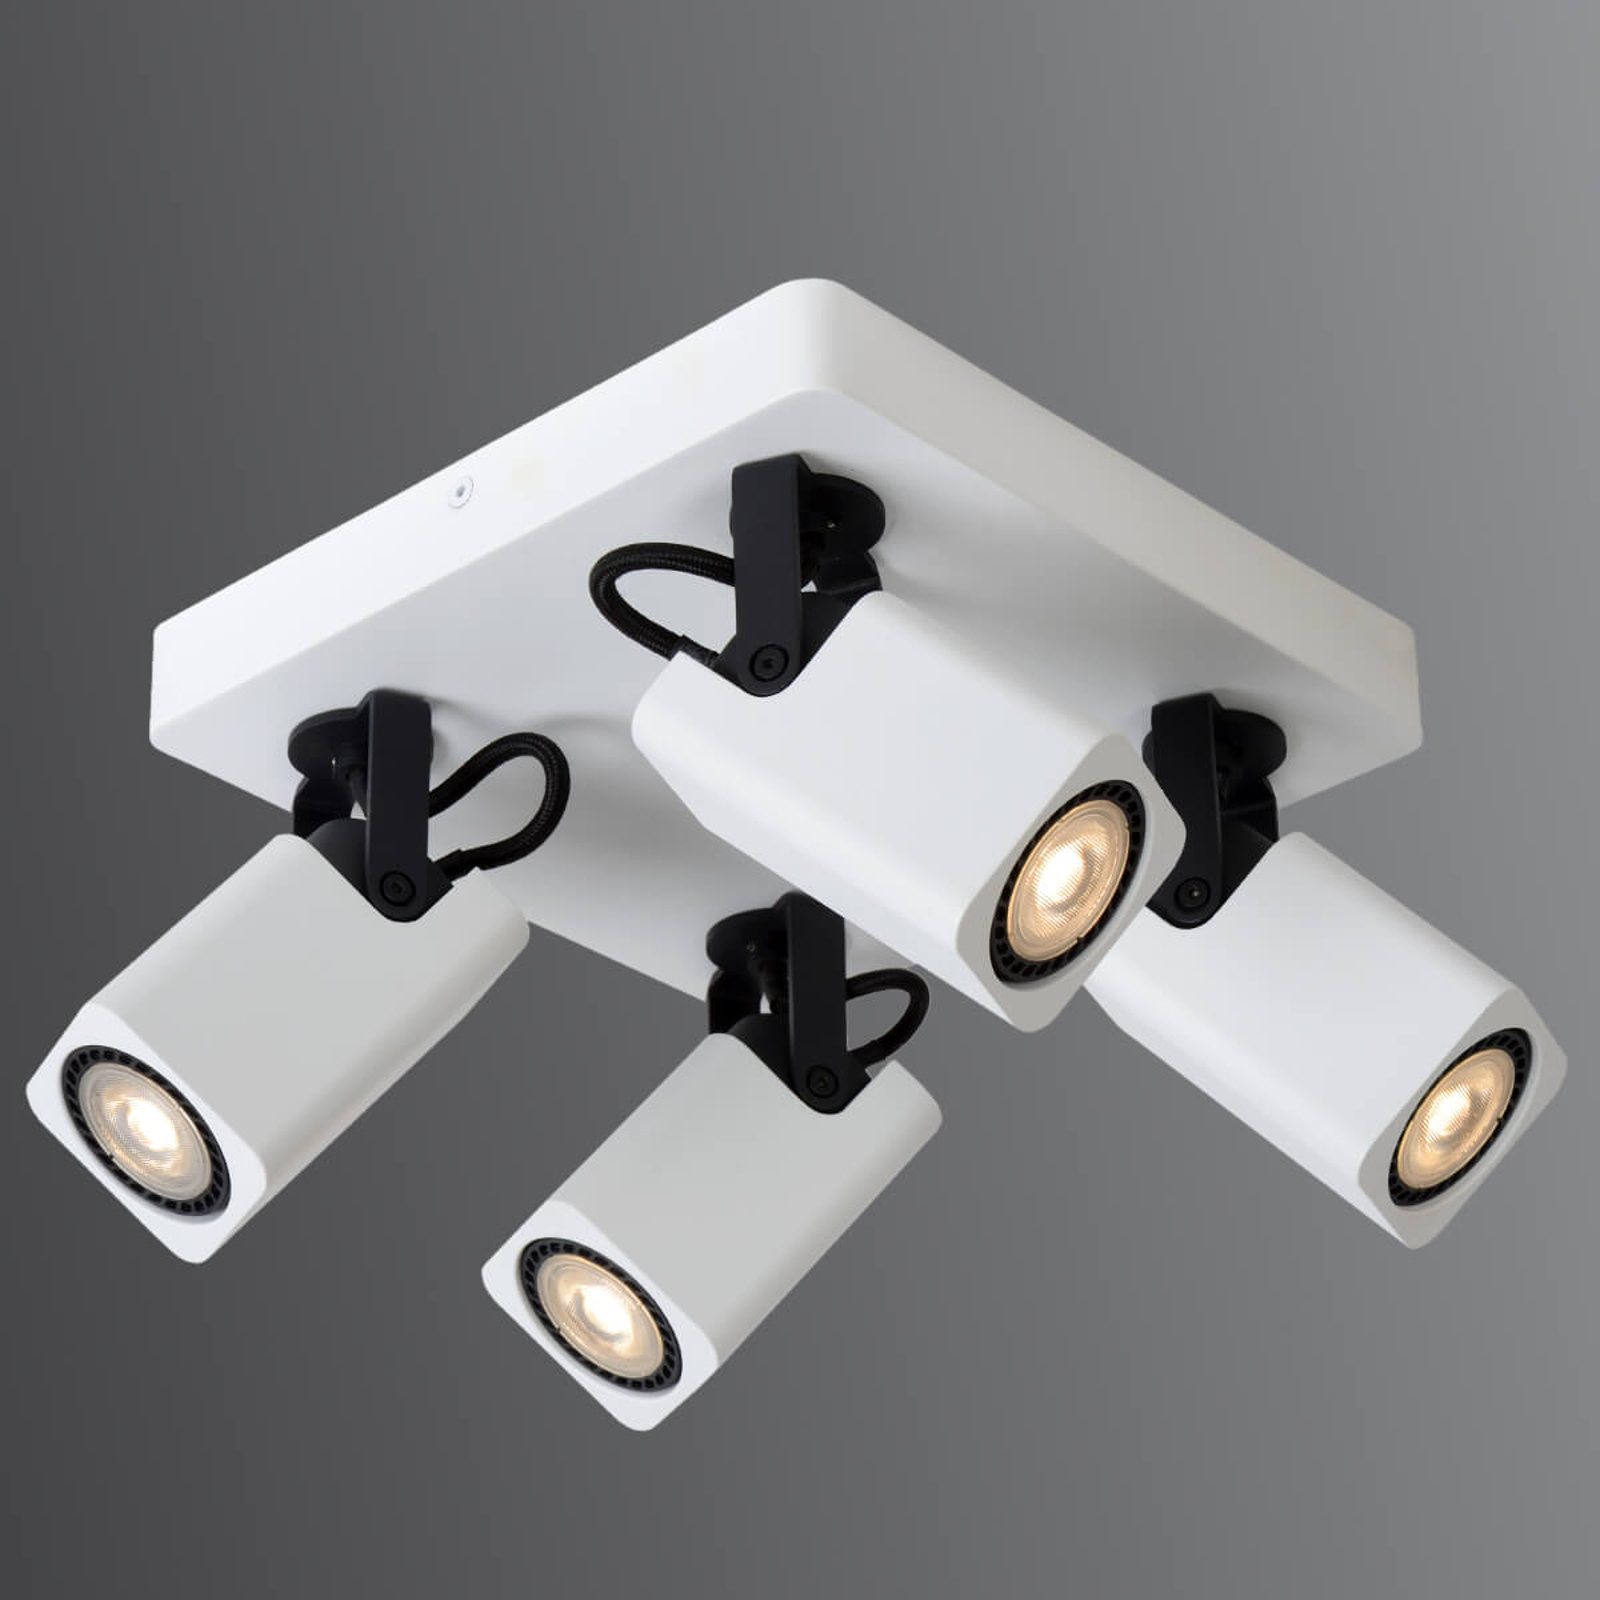 Acquista Plafoniera LED a 4 luci Roax